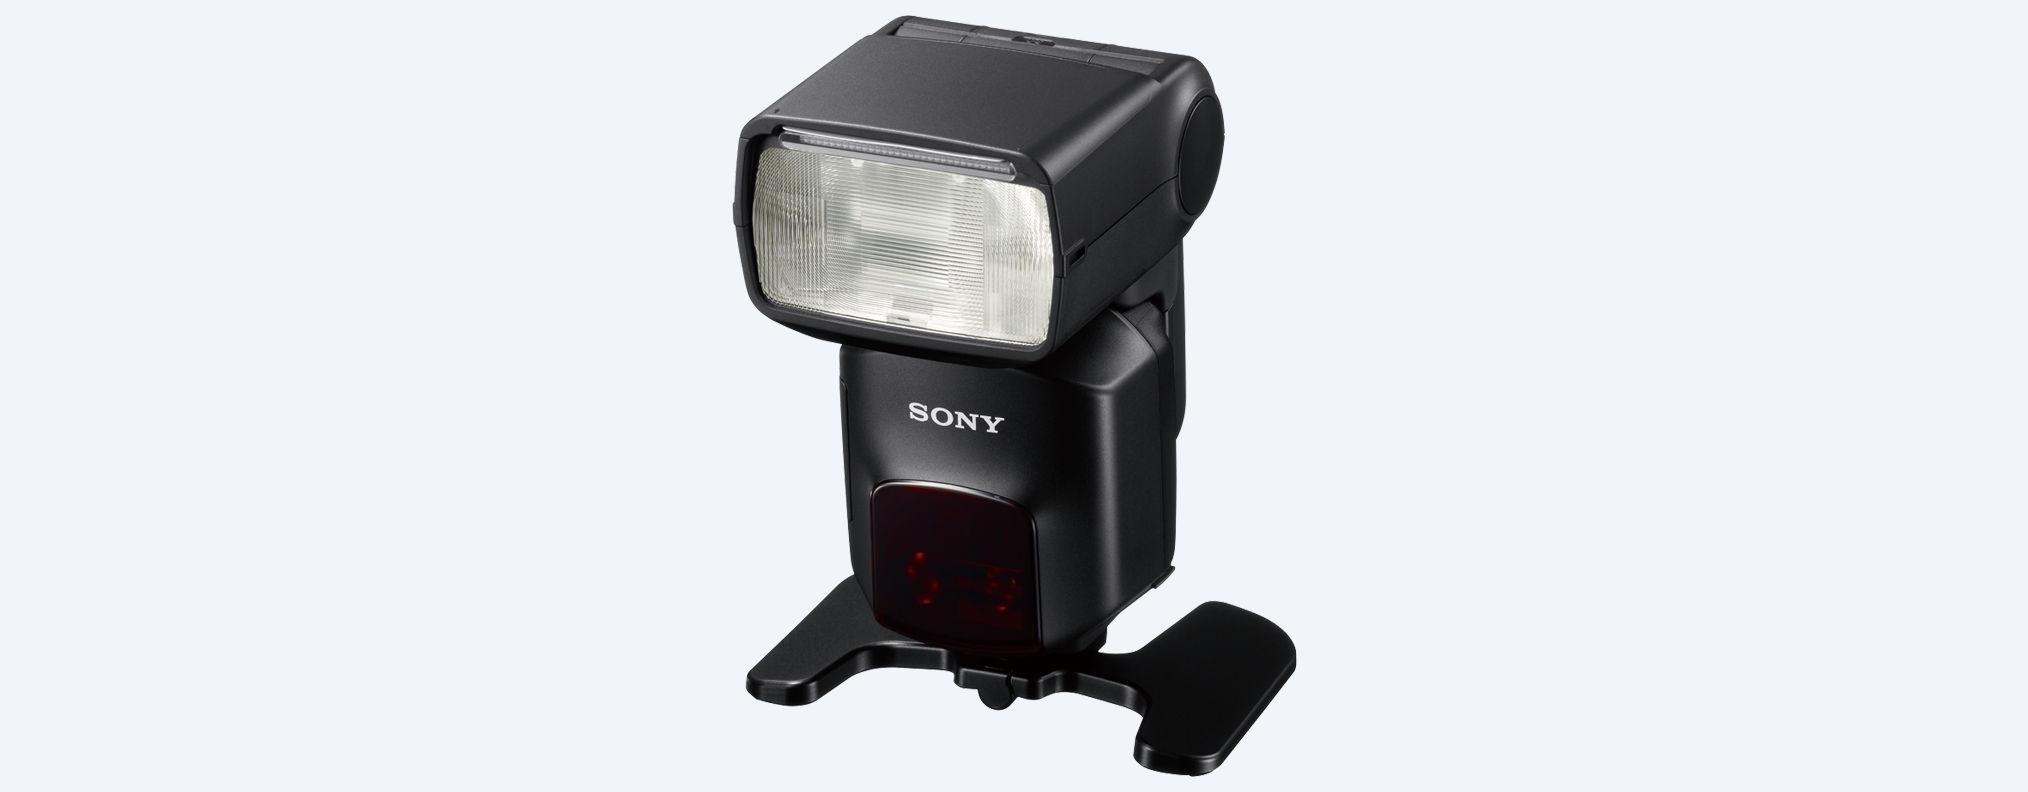 SONY Blixt HVL-F60M